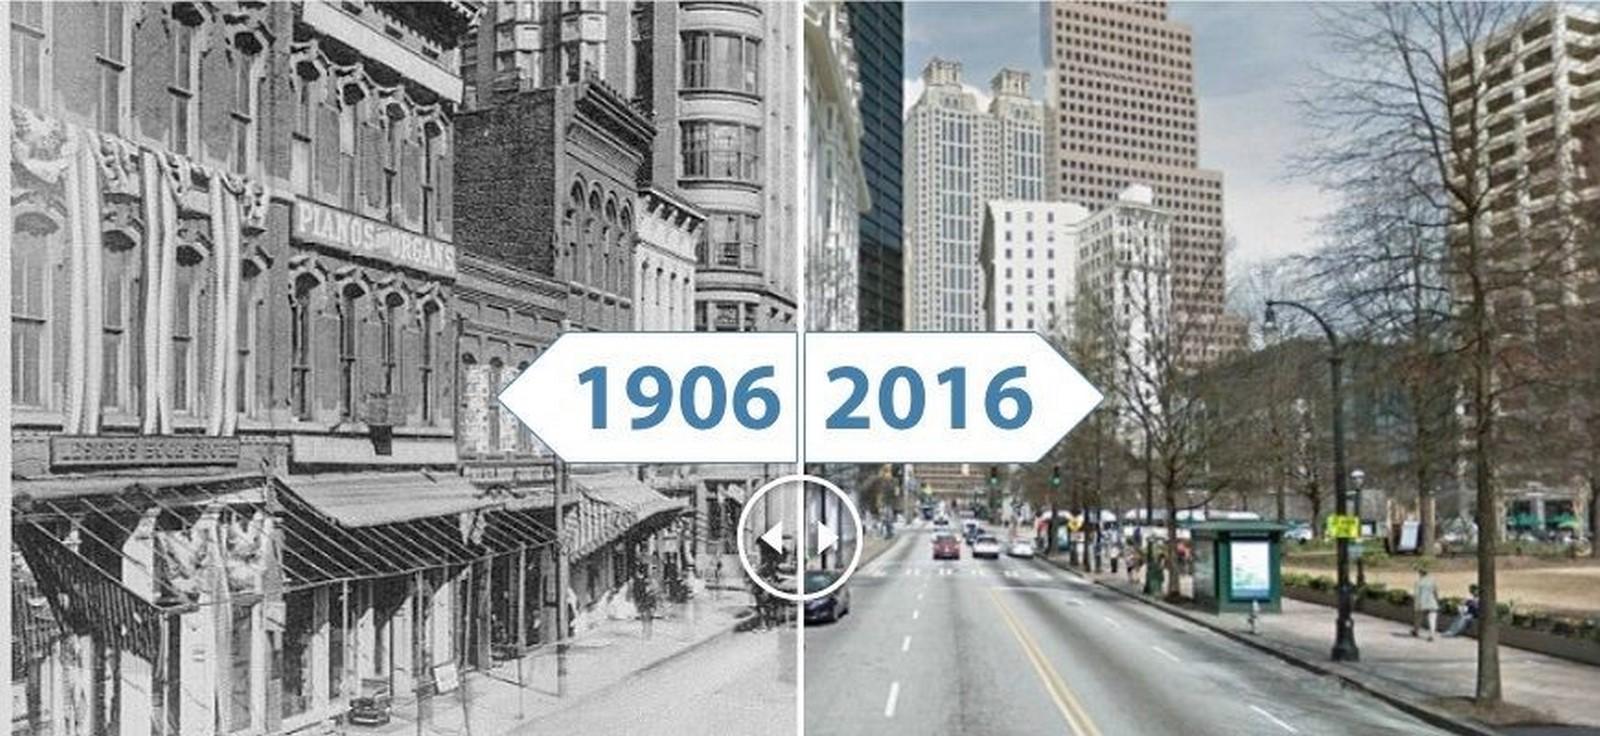 Rebuilding the City: City of Atlanta - Sheet1